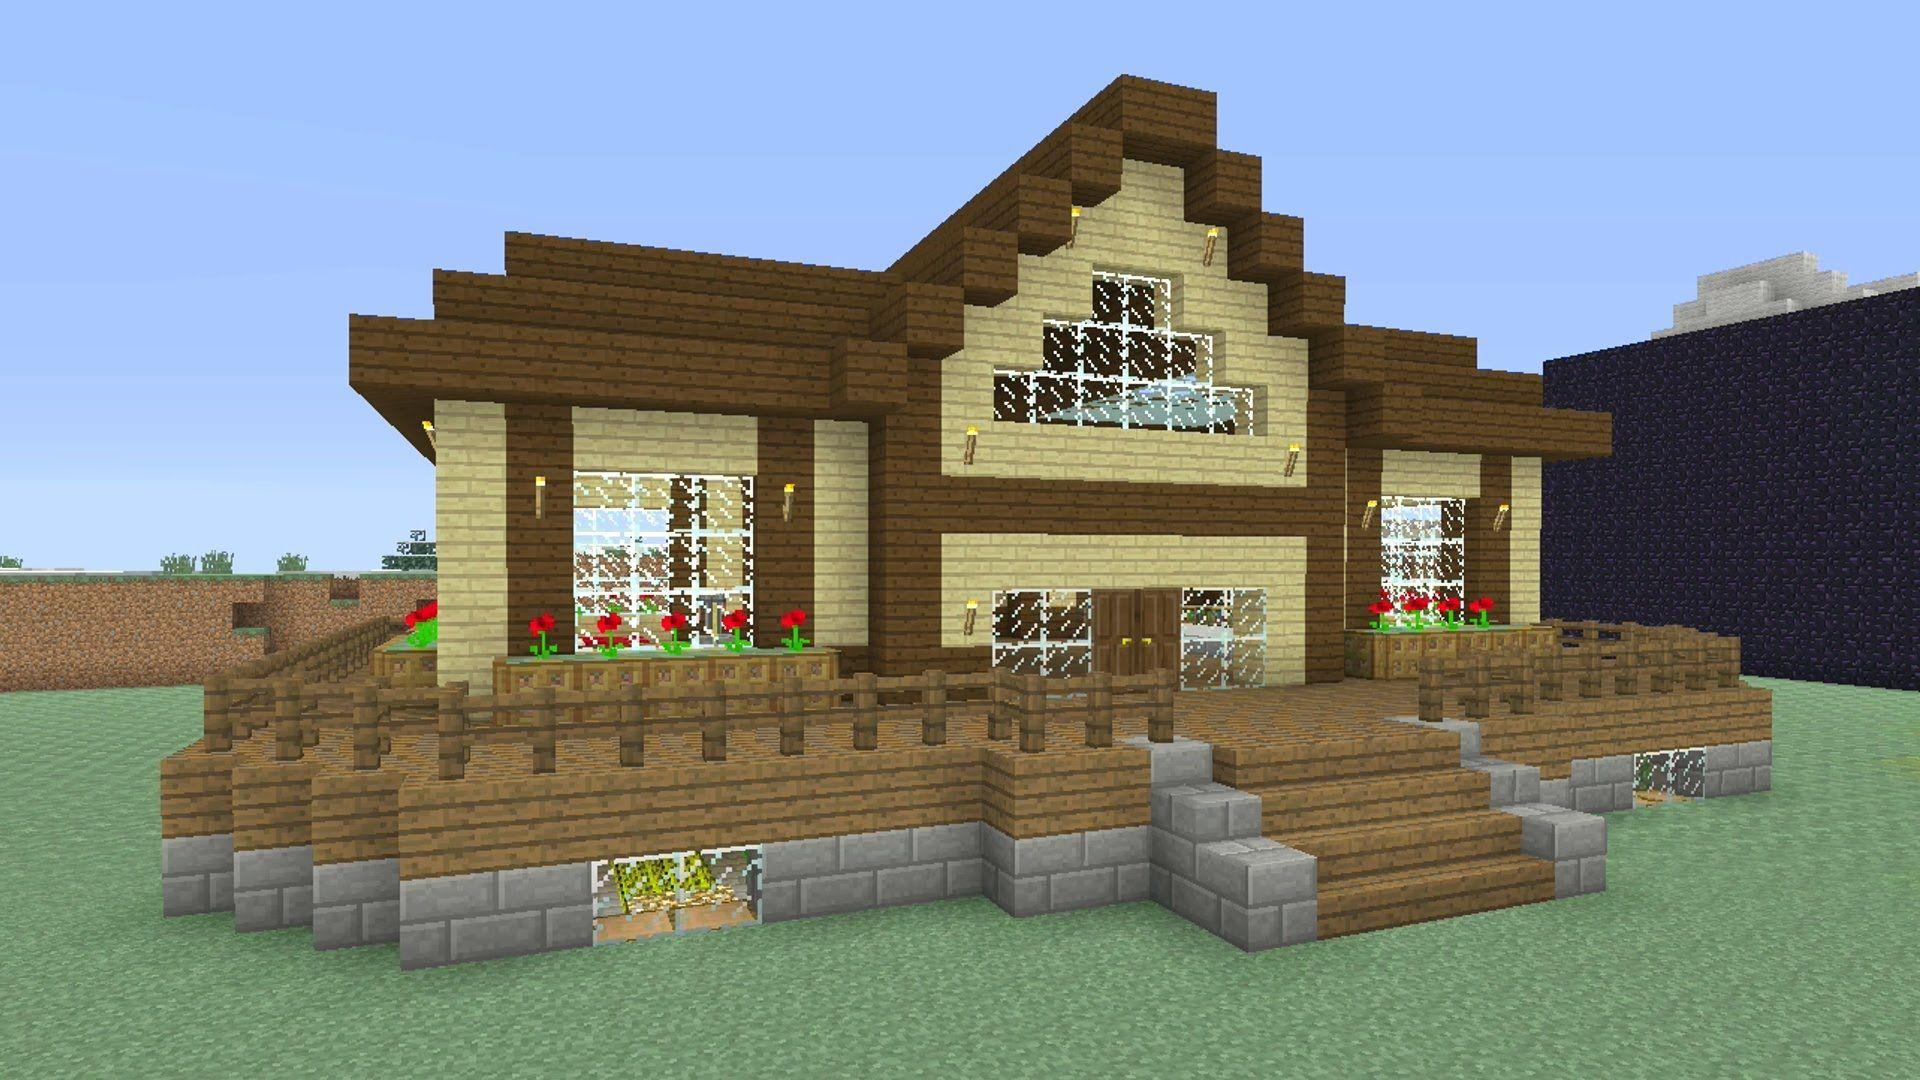 Pin by Jolene Ortega on Minecraft houses Minecraft